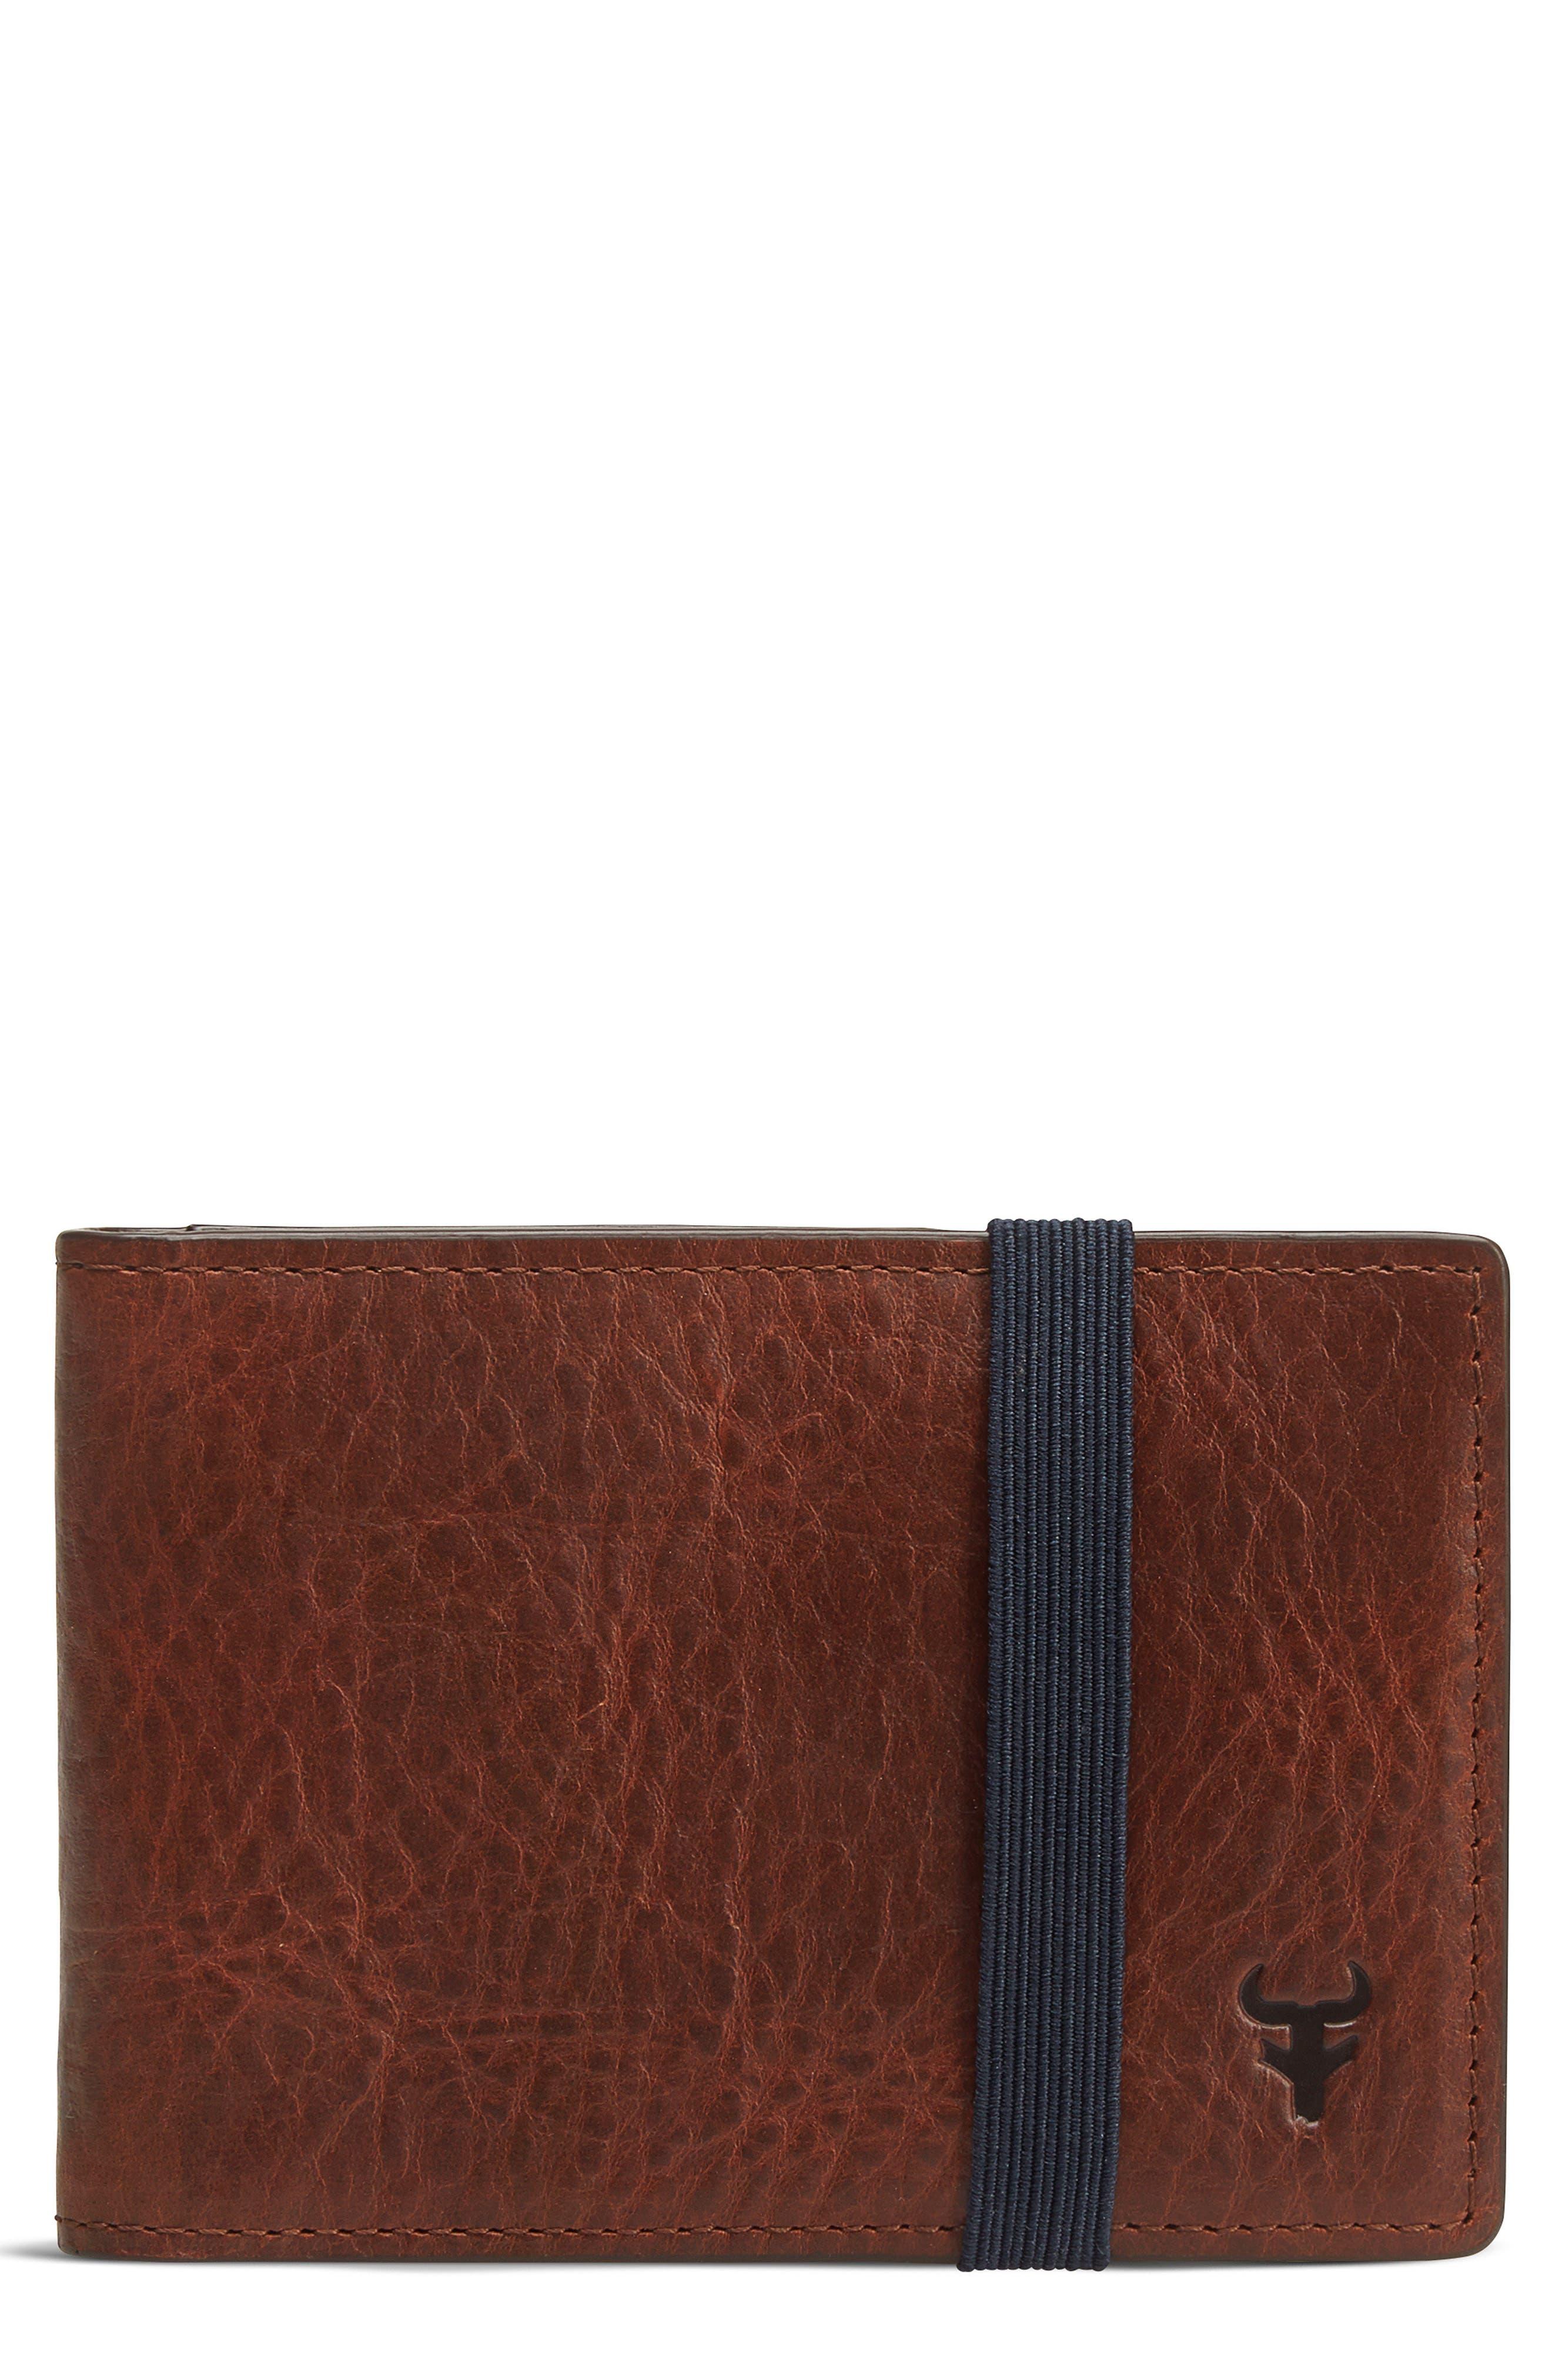 Leather Money Clip Wallet,                         Main,                         color, 211